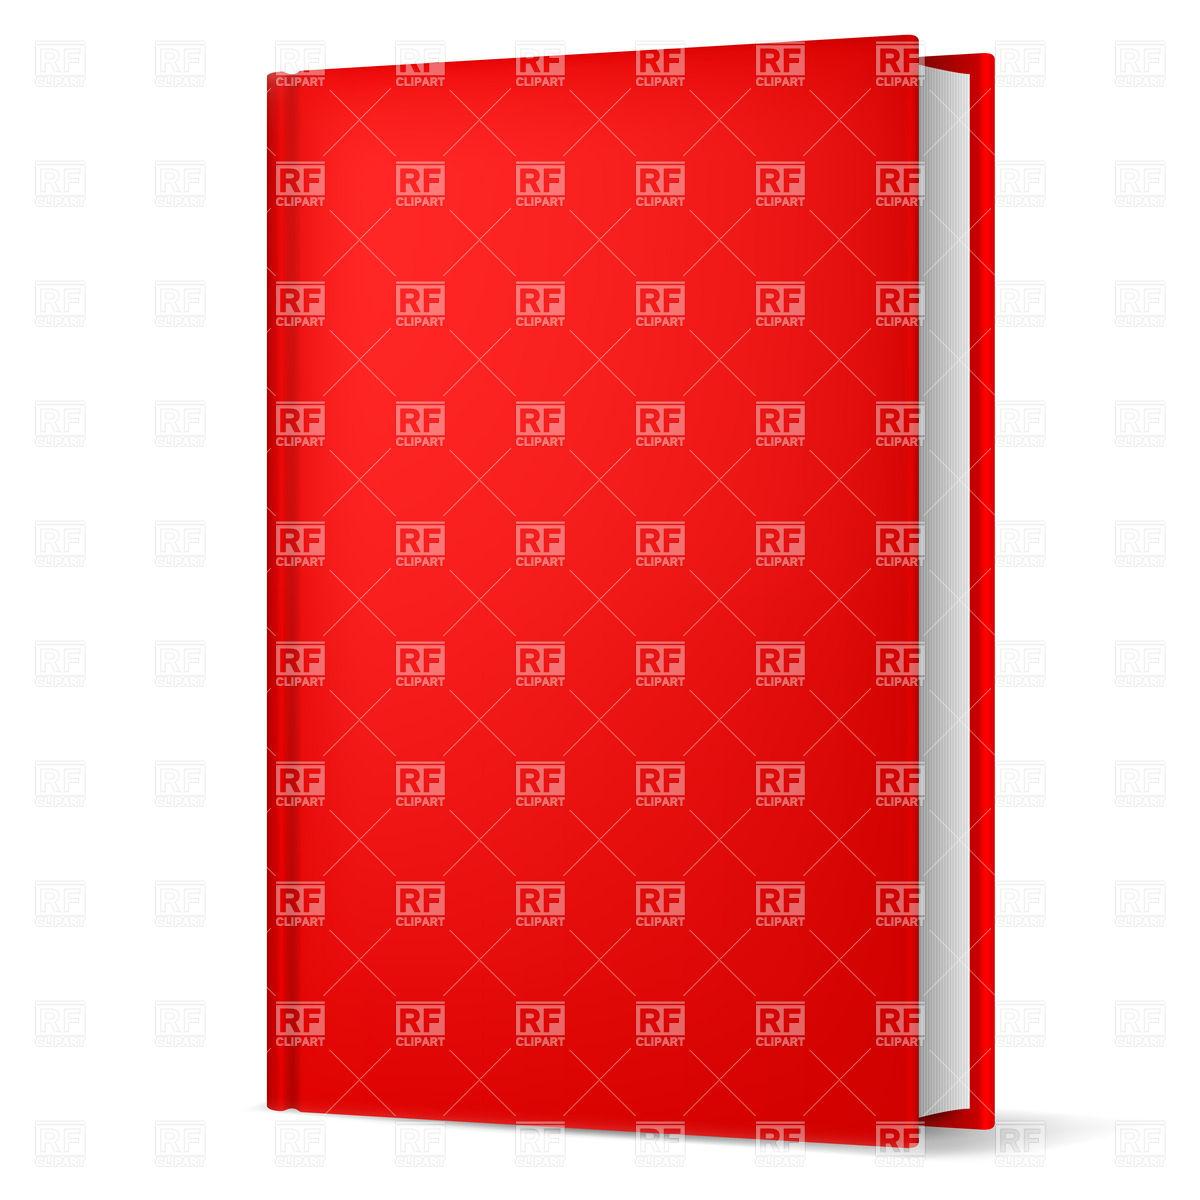 Hardback red book Vector Image #20860.